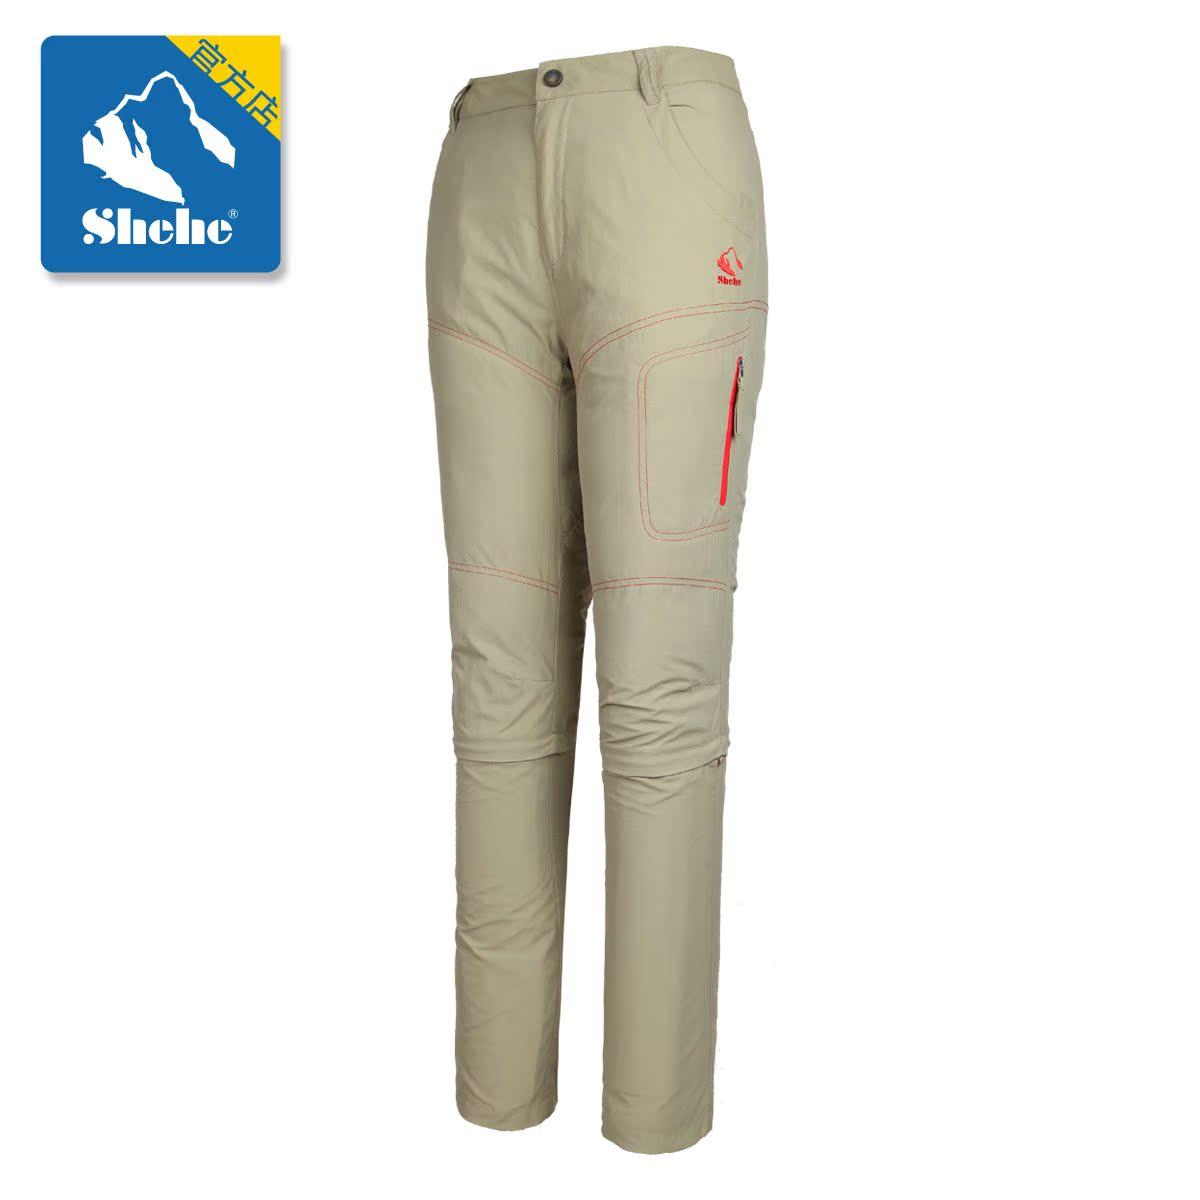 Быстросохнущие штаны Shehe Shehe / pole star